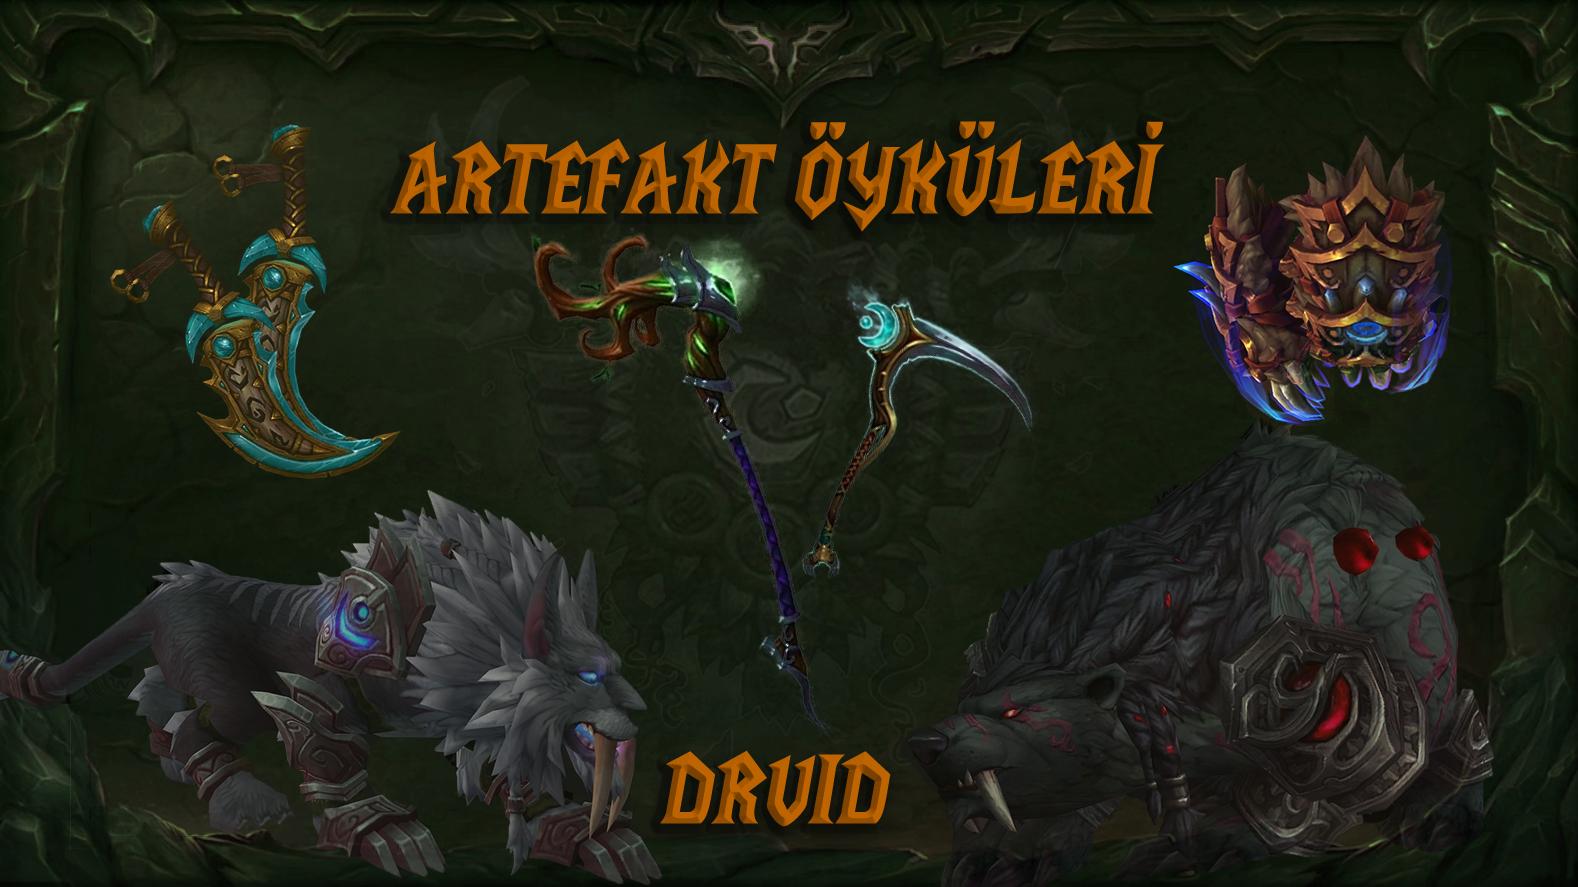 lorekeeper-artefakt-oykuleri-druid